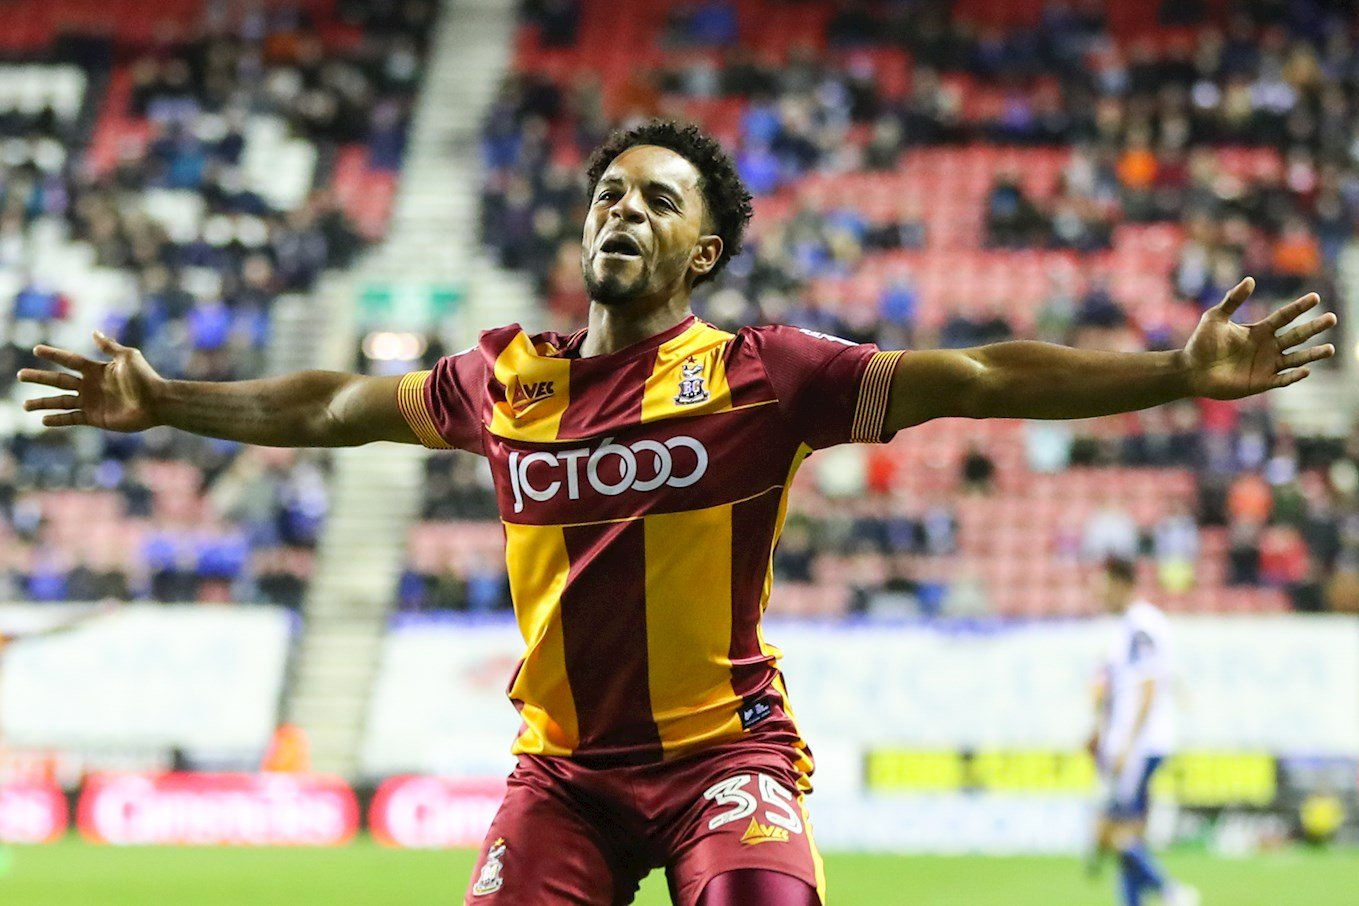 TEAM NEWS | WIGAN ATHLETIC (HOME) - News - Bradford City